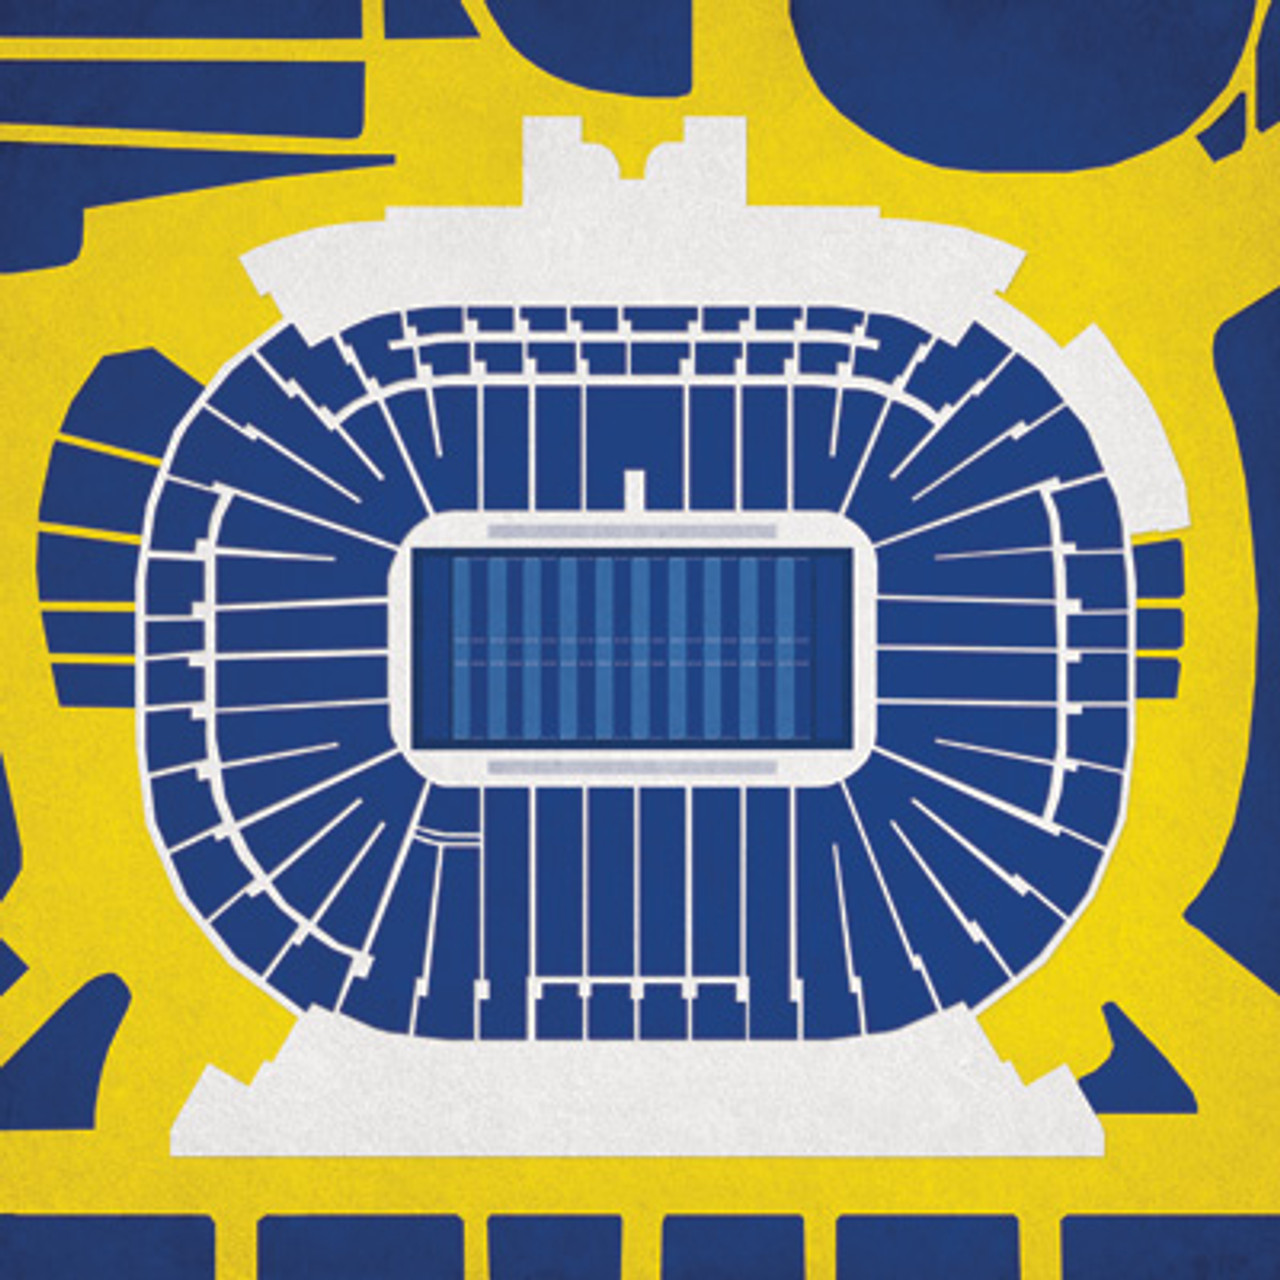 Michigan Wolverines - Michigan Stadium City Print